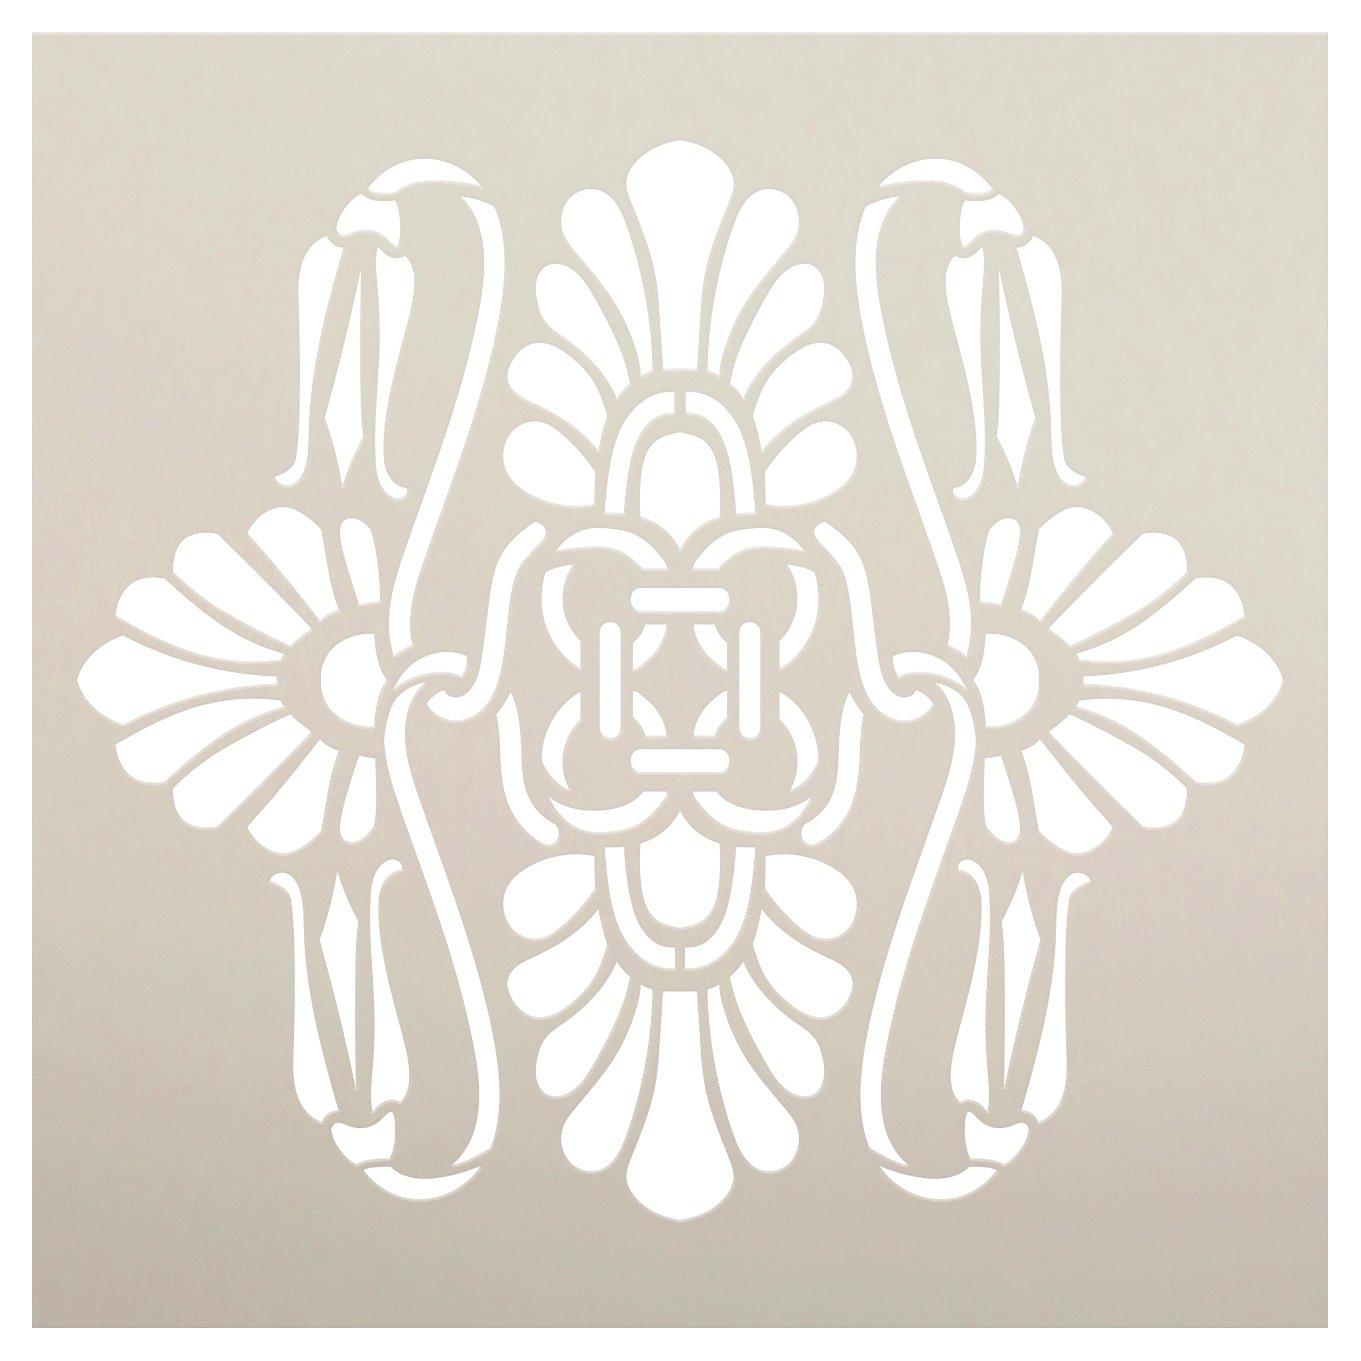 Palmette Lily Knot Pattern Stencil by StudioR12 | Craft DIY Greek Tile Backsplash Home Decor | Paint Wood Sign | Reusable Mylar Template | Select Size